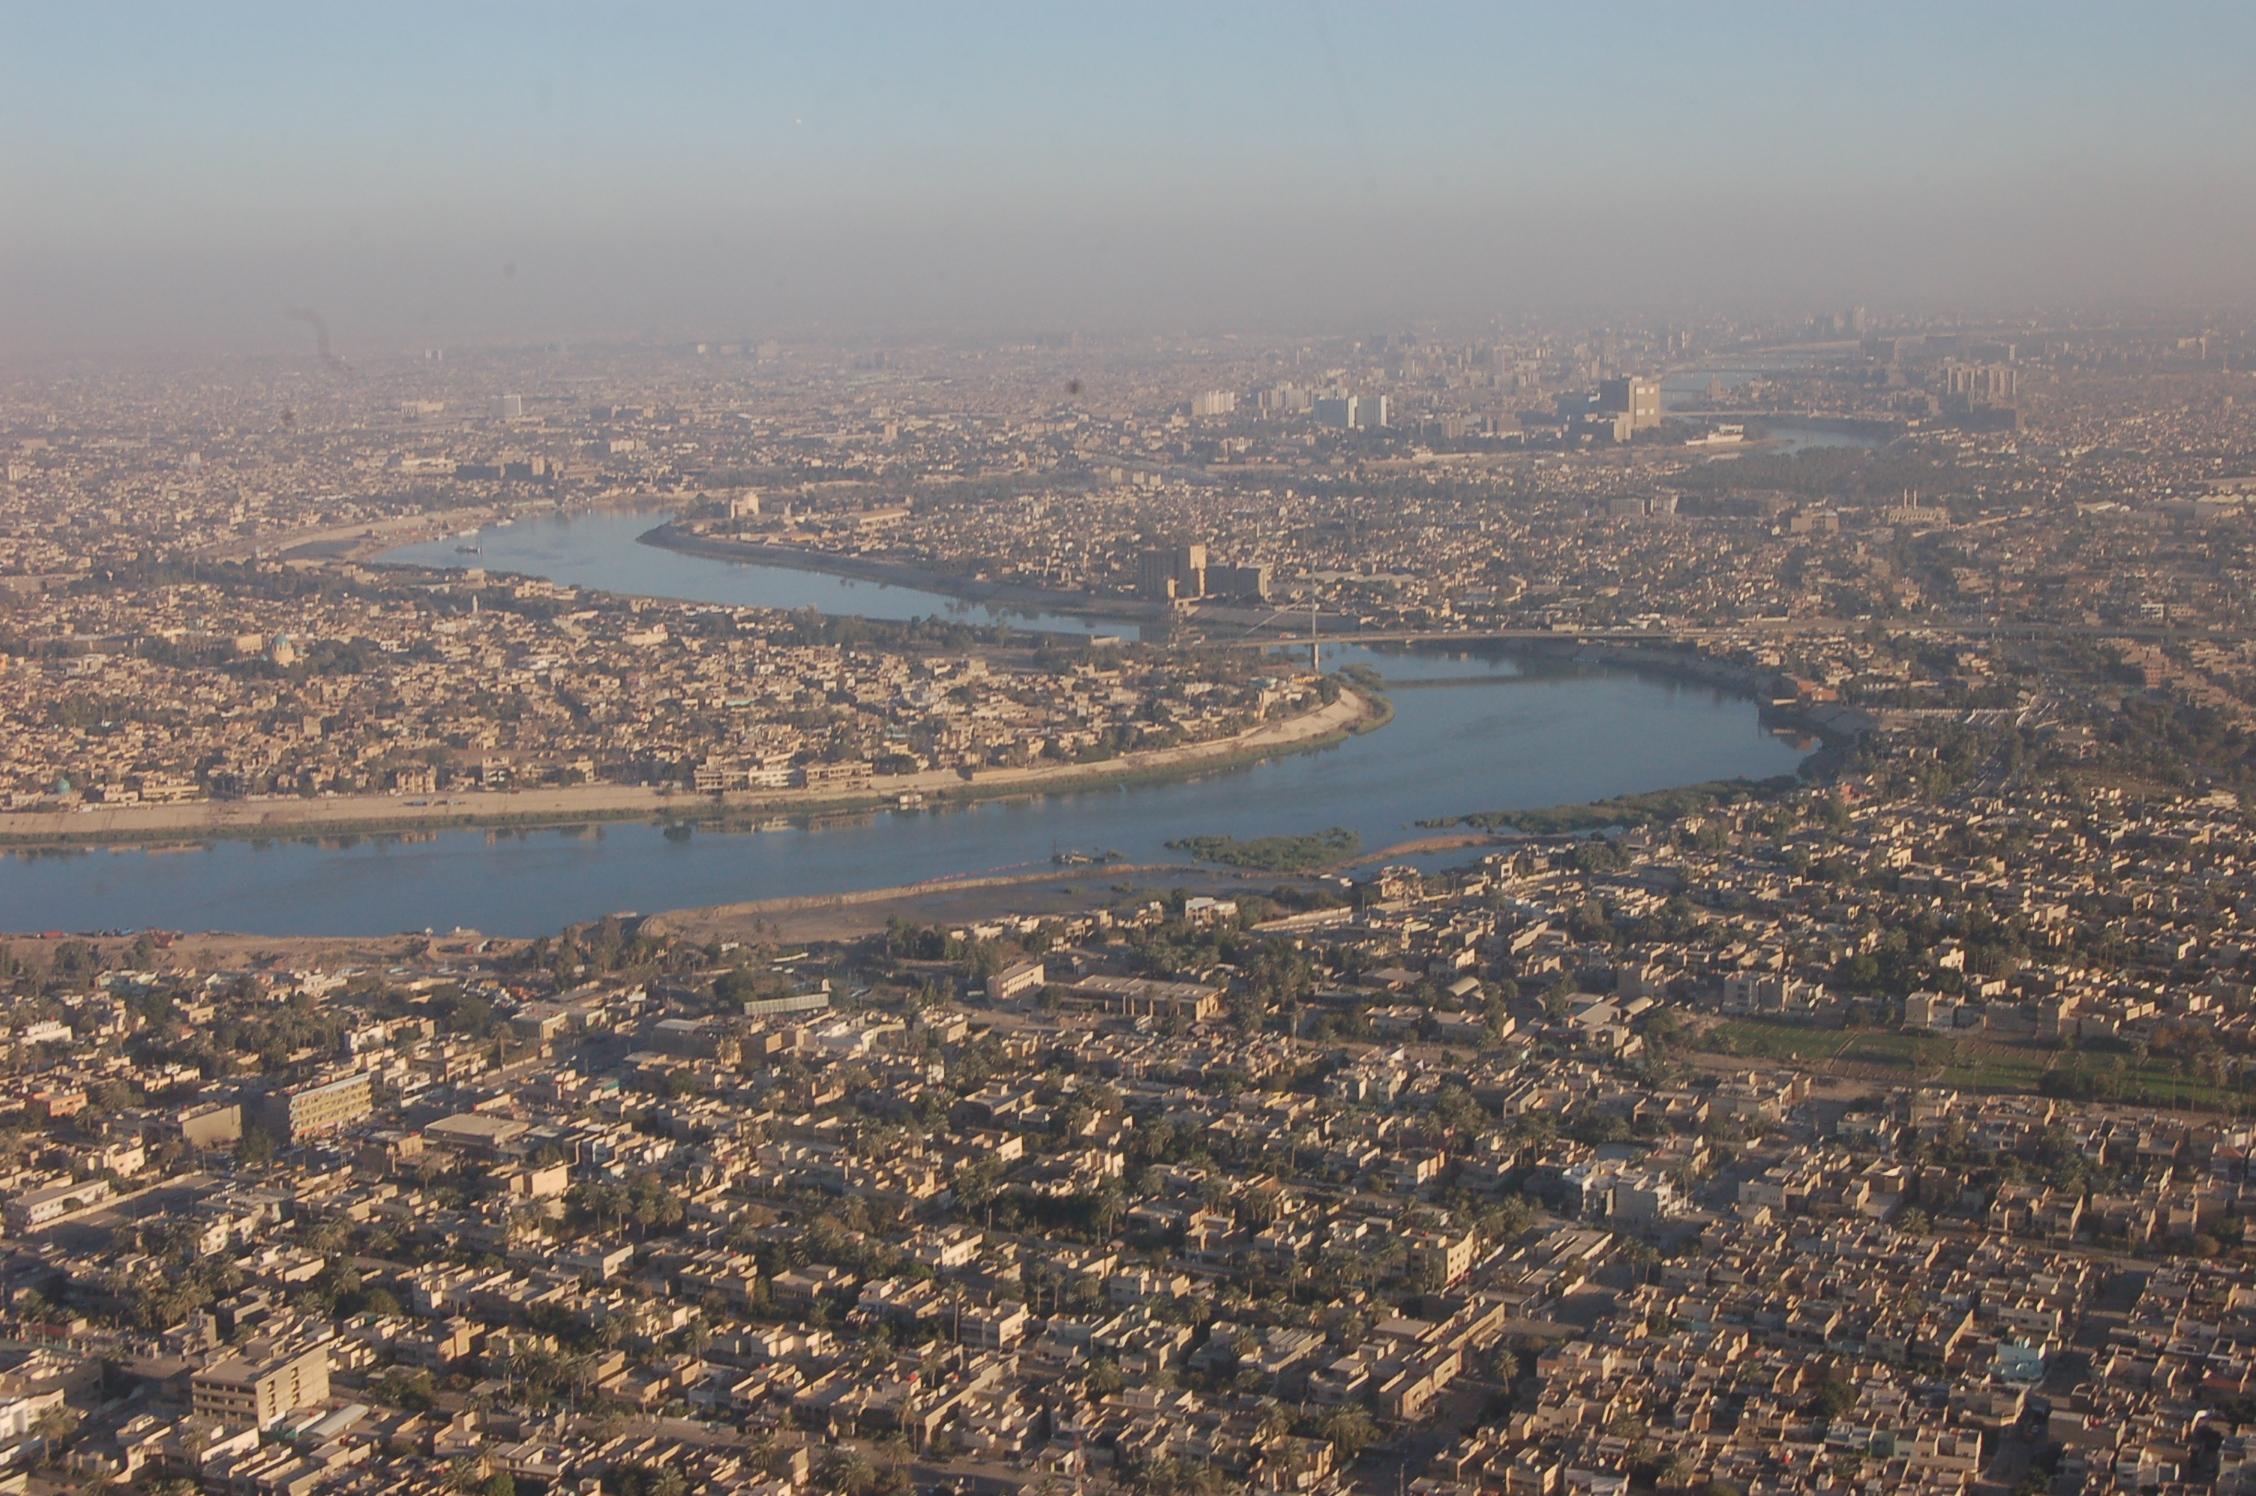 Panorama de Bagdad, capitale de l'Irak